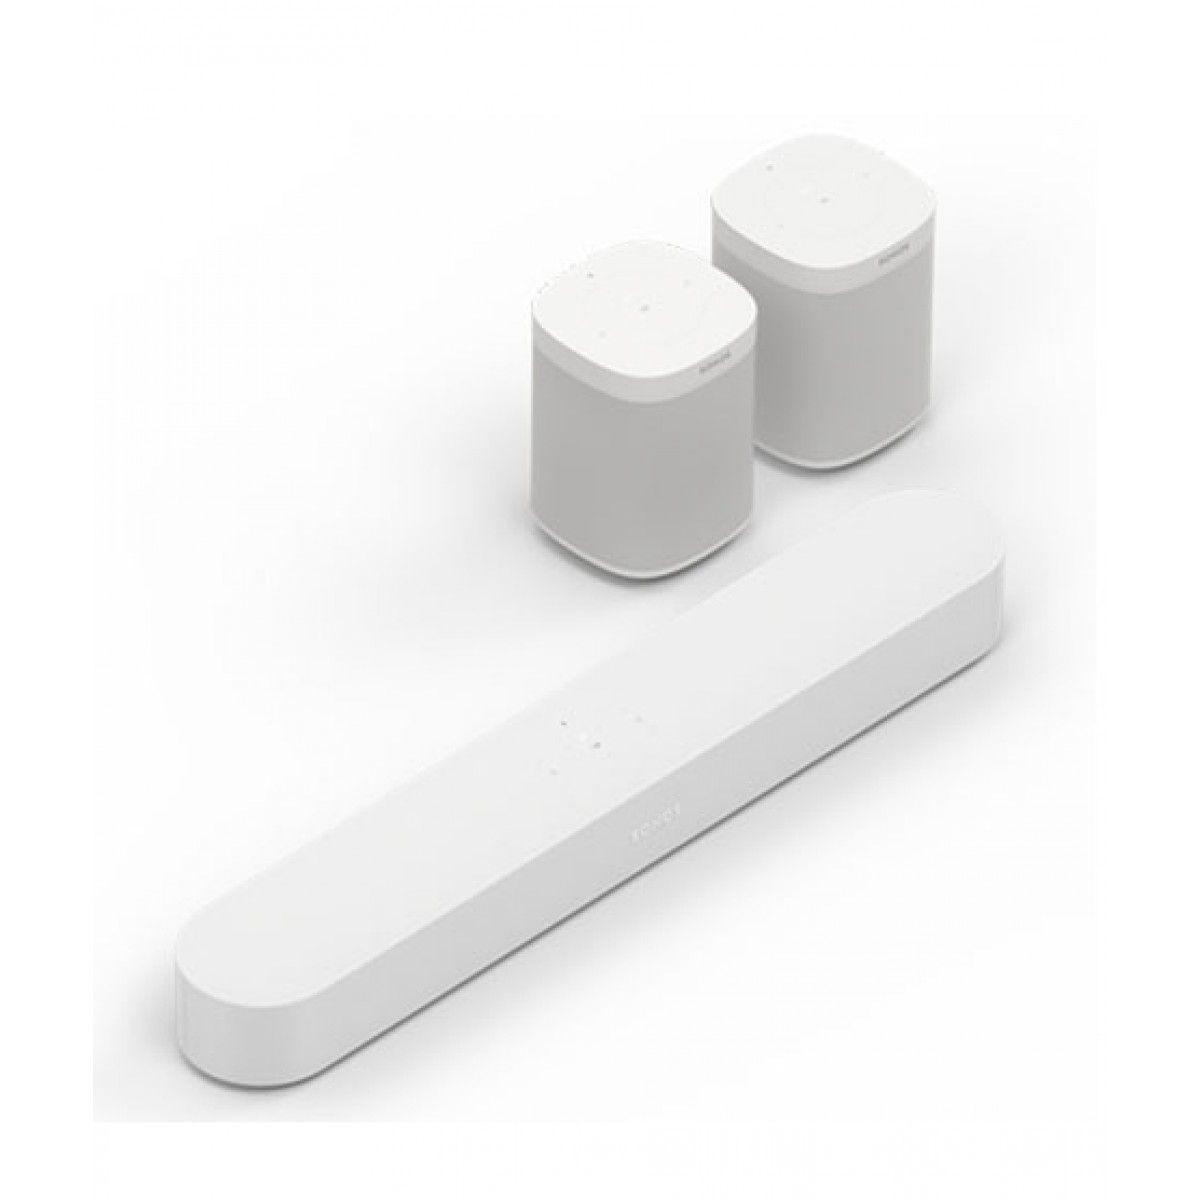 Sonos One Wireless Smart Speaker With Beam Set Of 3